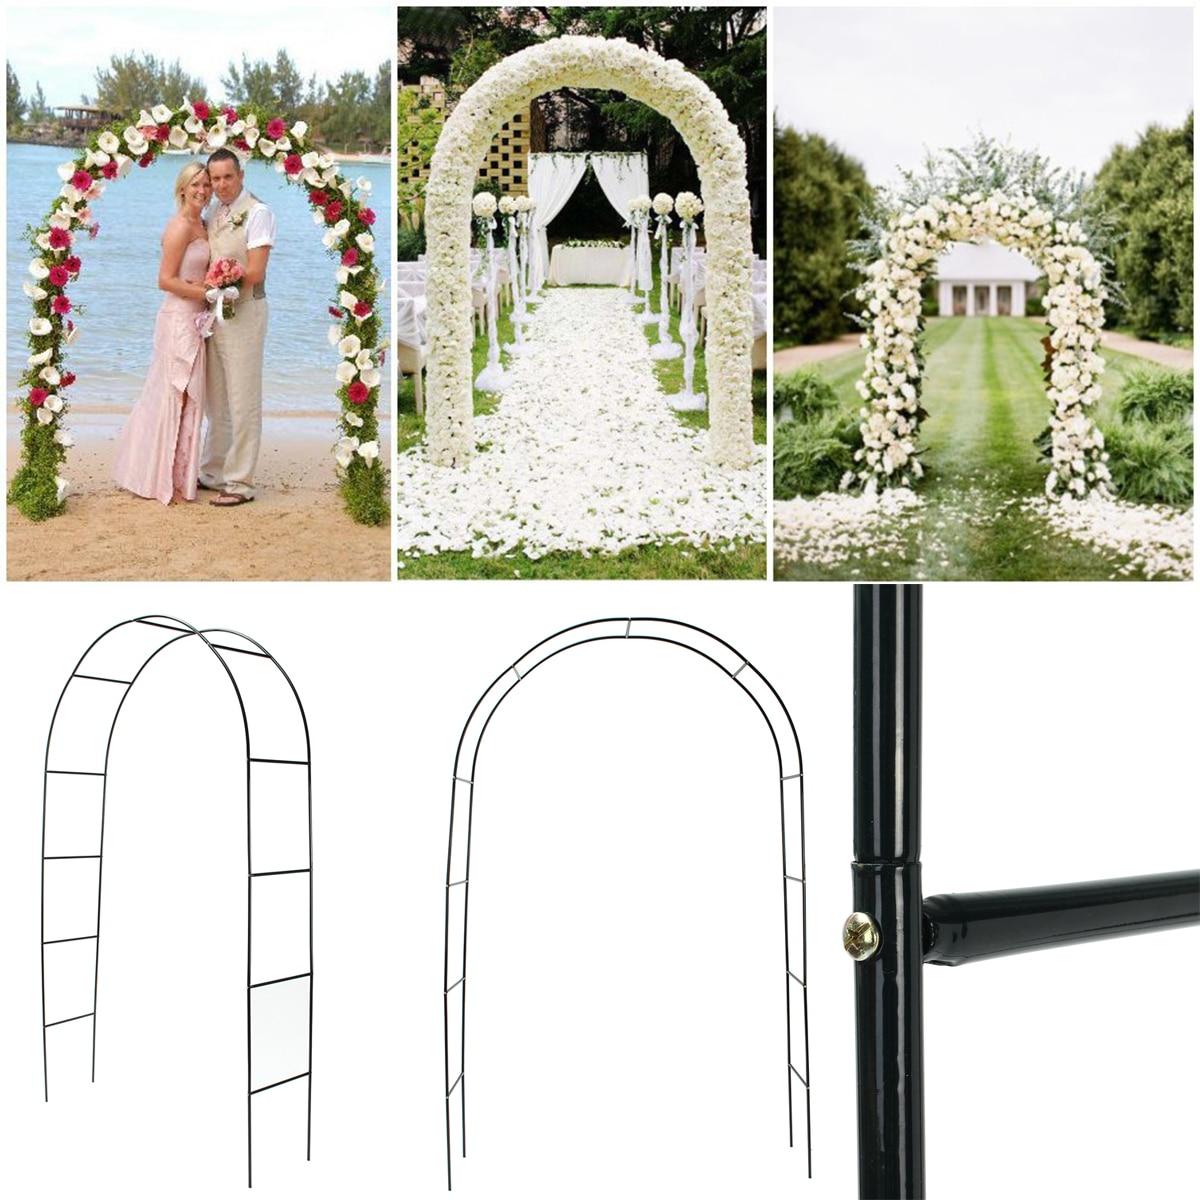 Iron Wedding Arch Decorative Garden Backdrop Pergola Stand Flower Frame For Marriage birthday wedding Party Decoration DIY Arch(China)